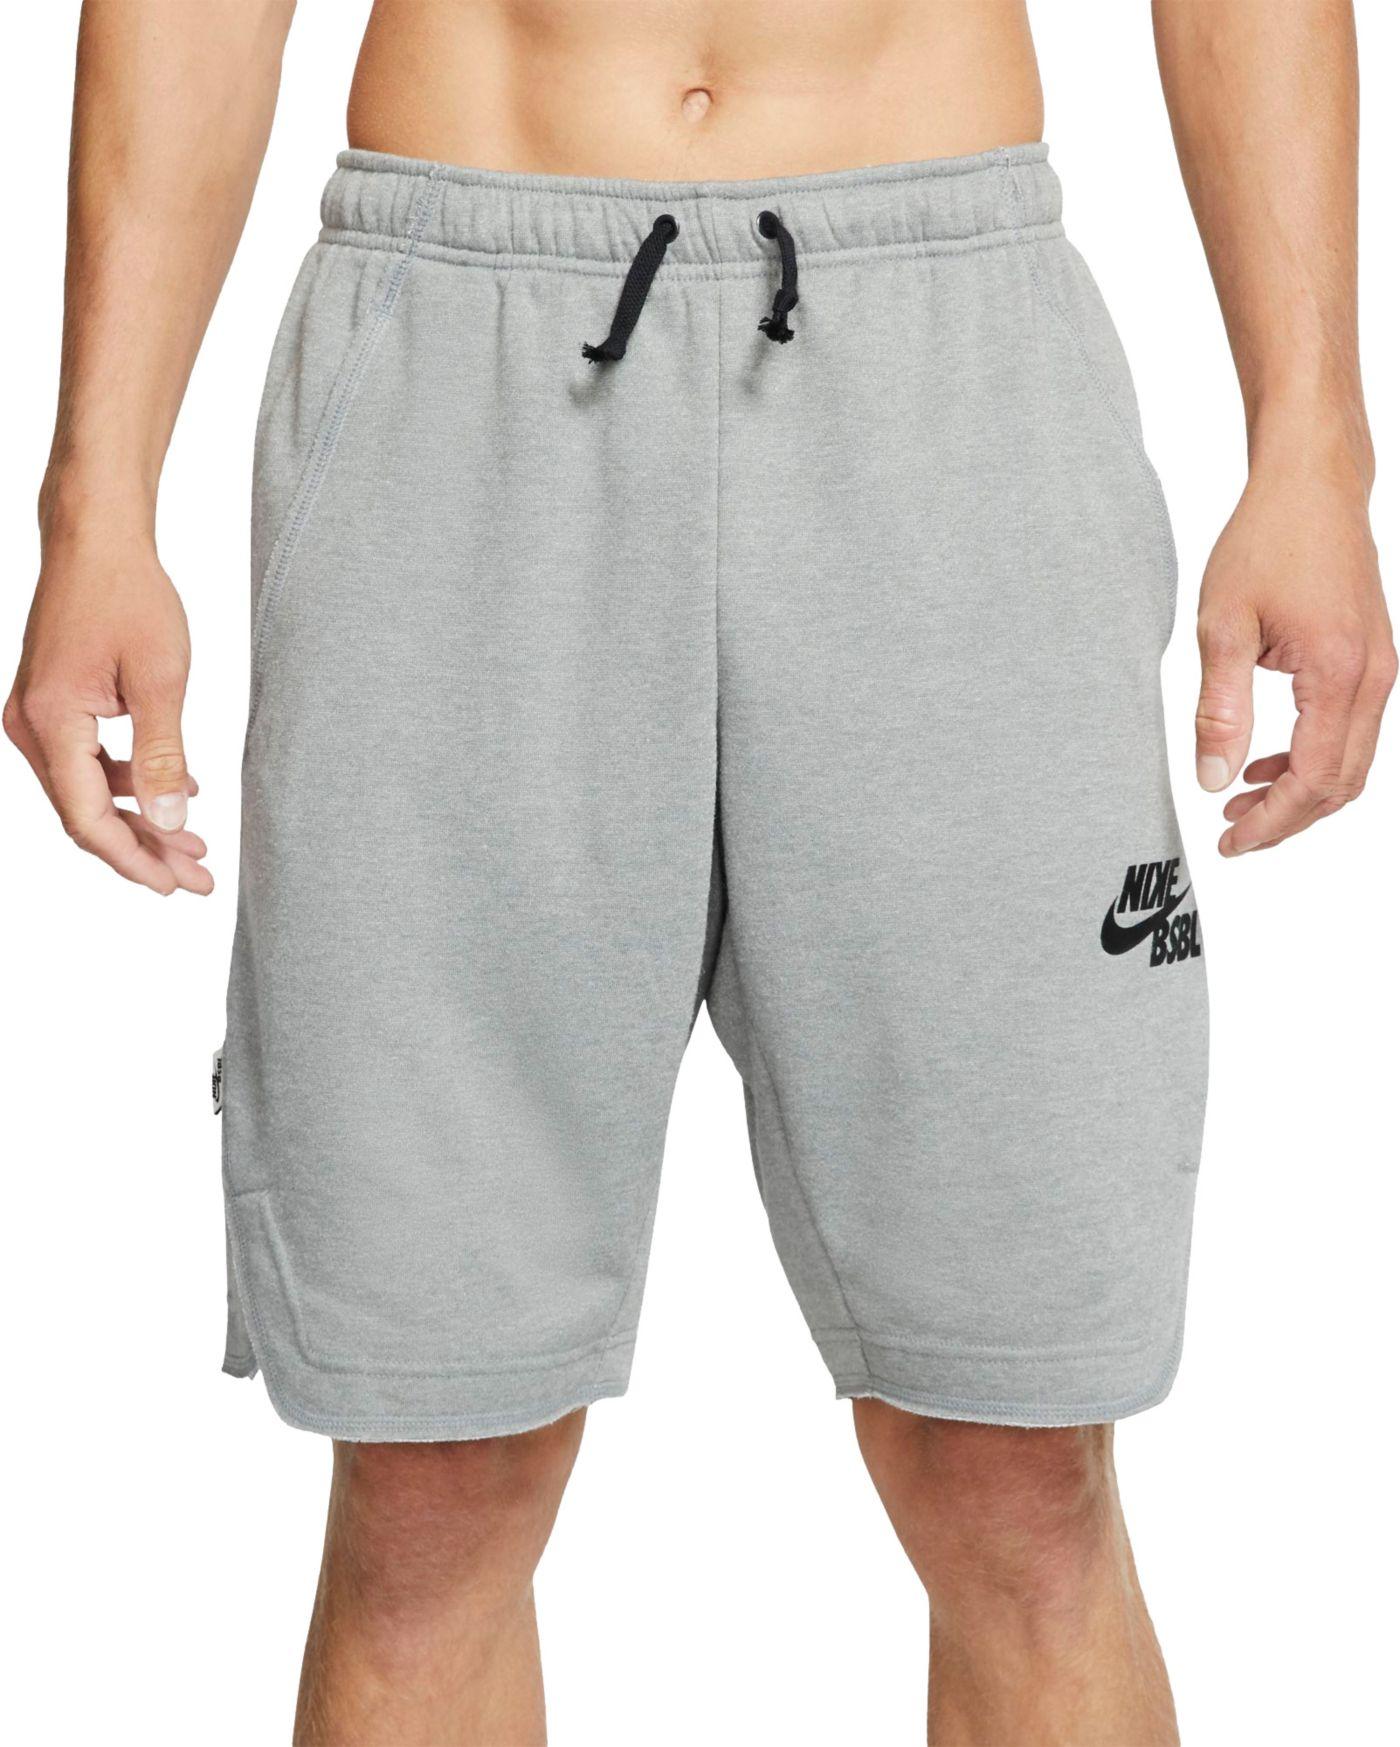 Nike Men's Baseball Shorts